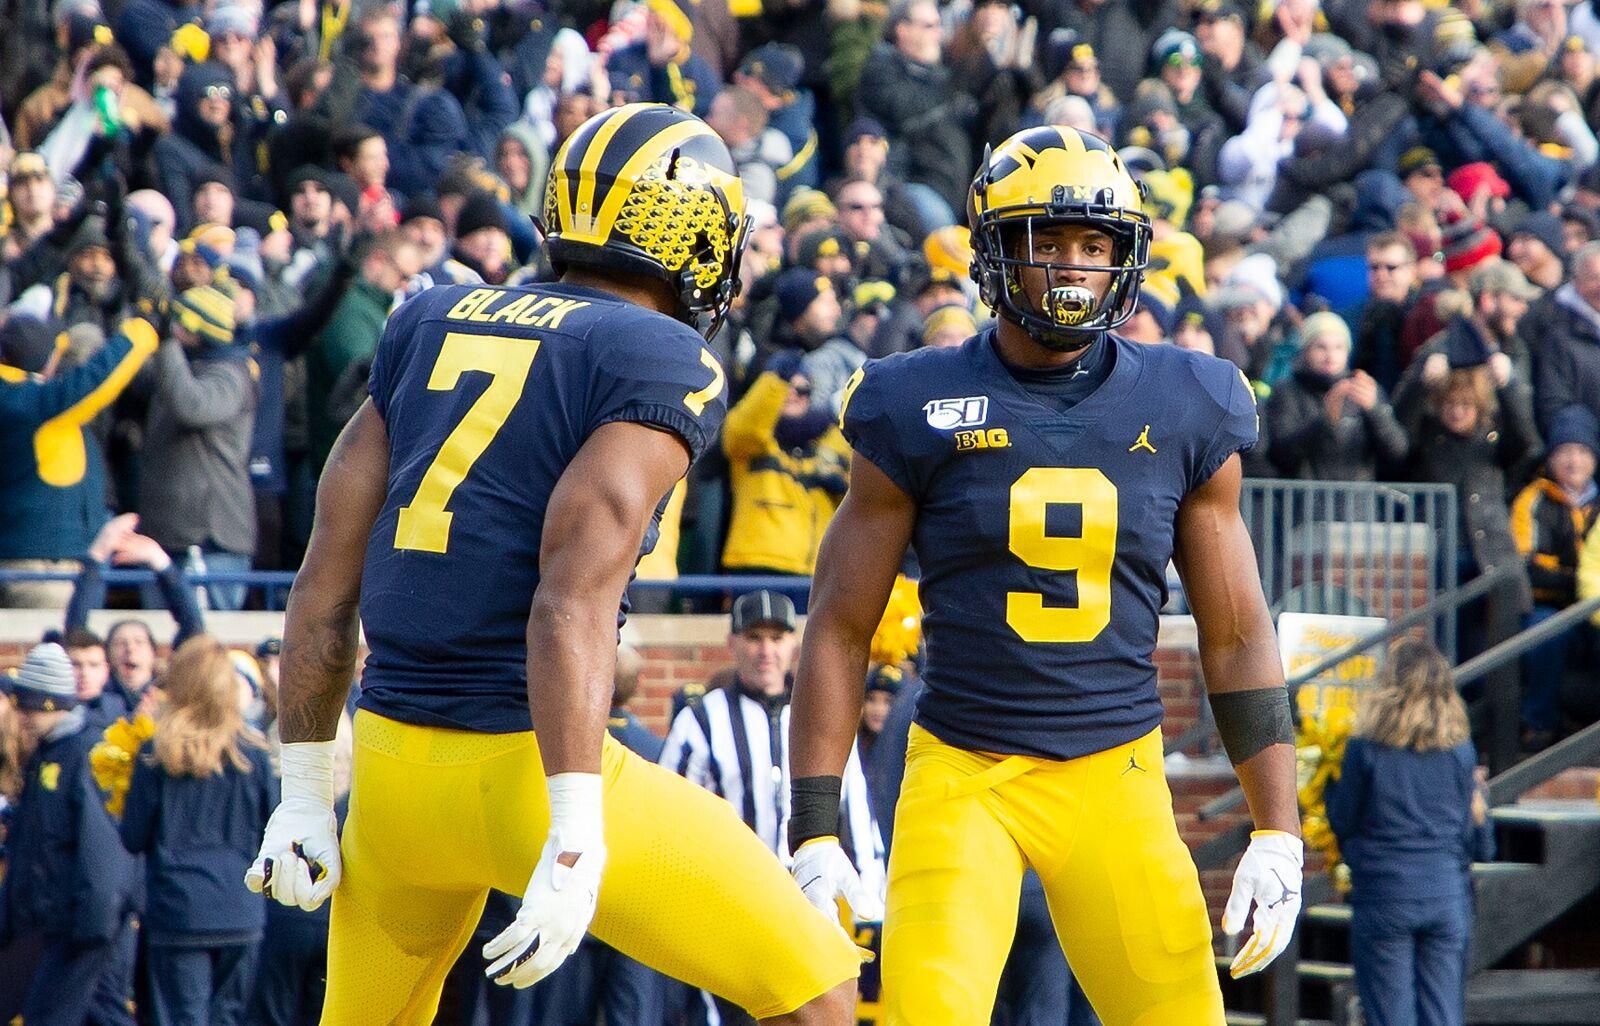 Michigan Football: Wolverines unfortunately draw Crimson Tide